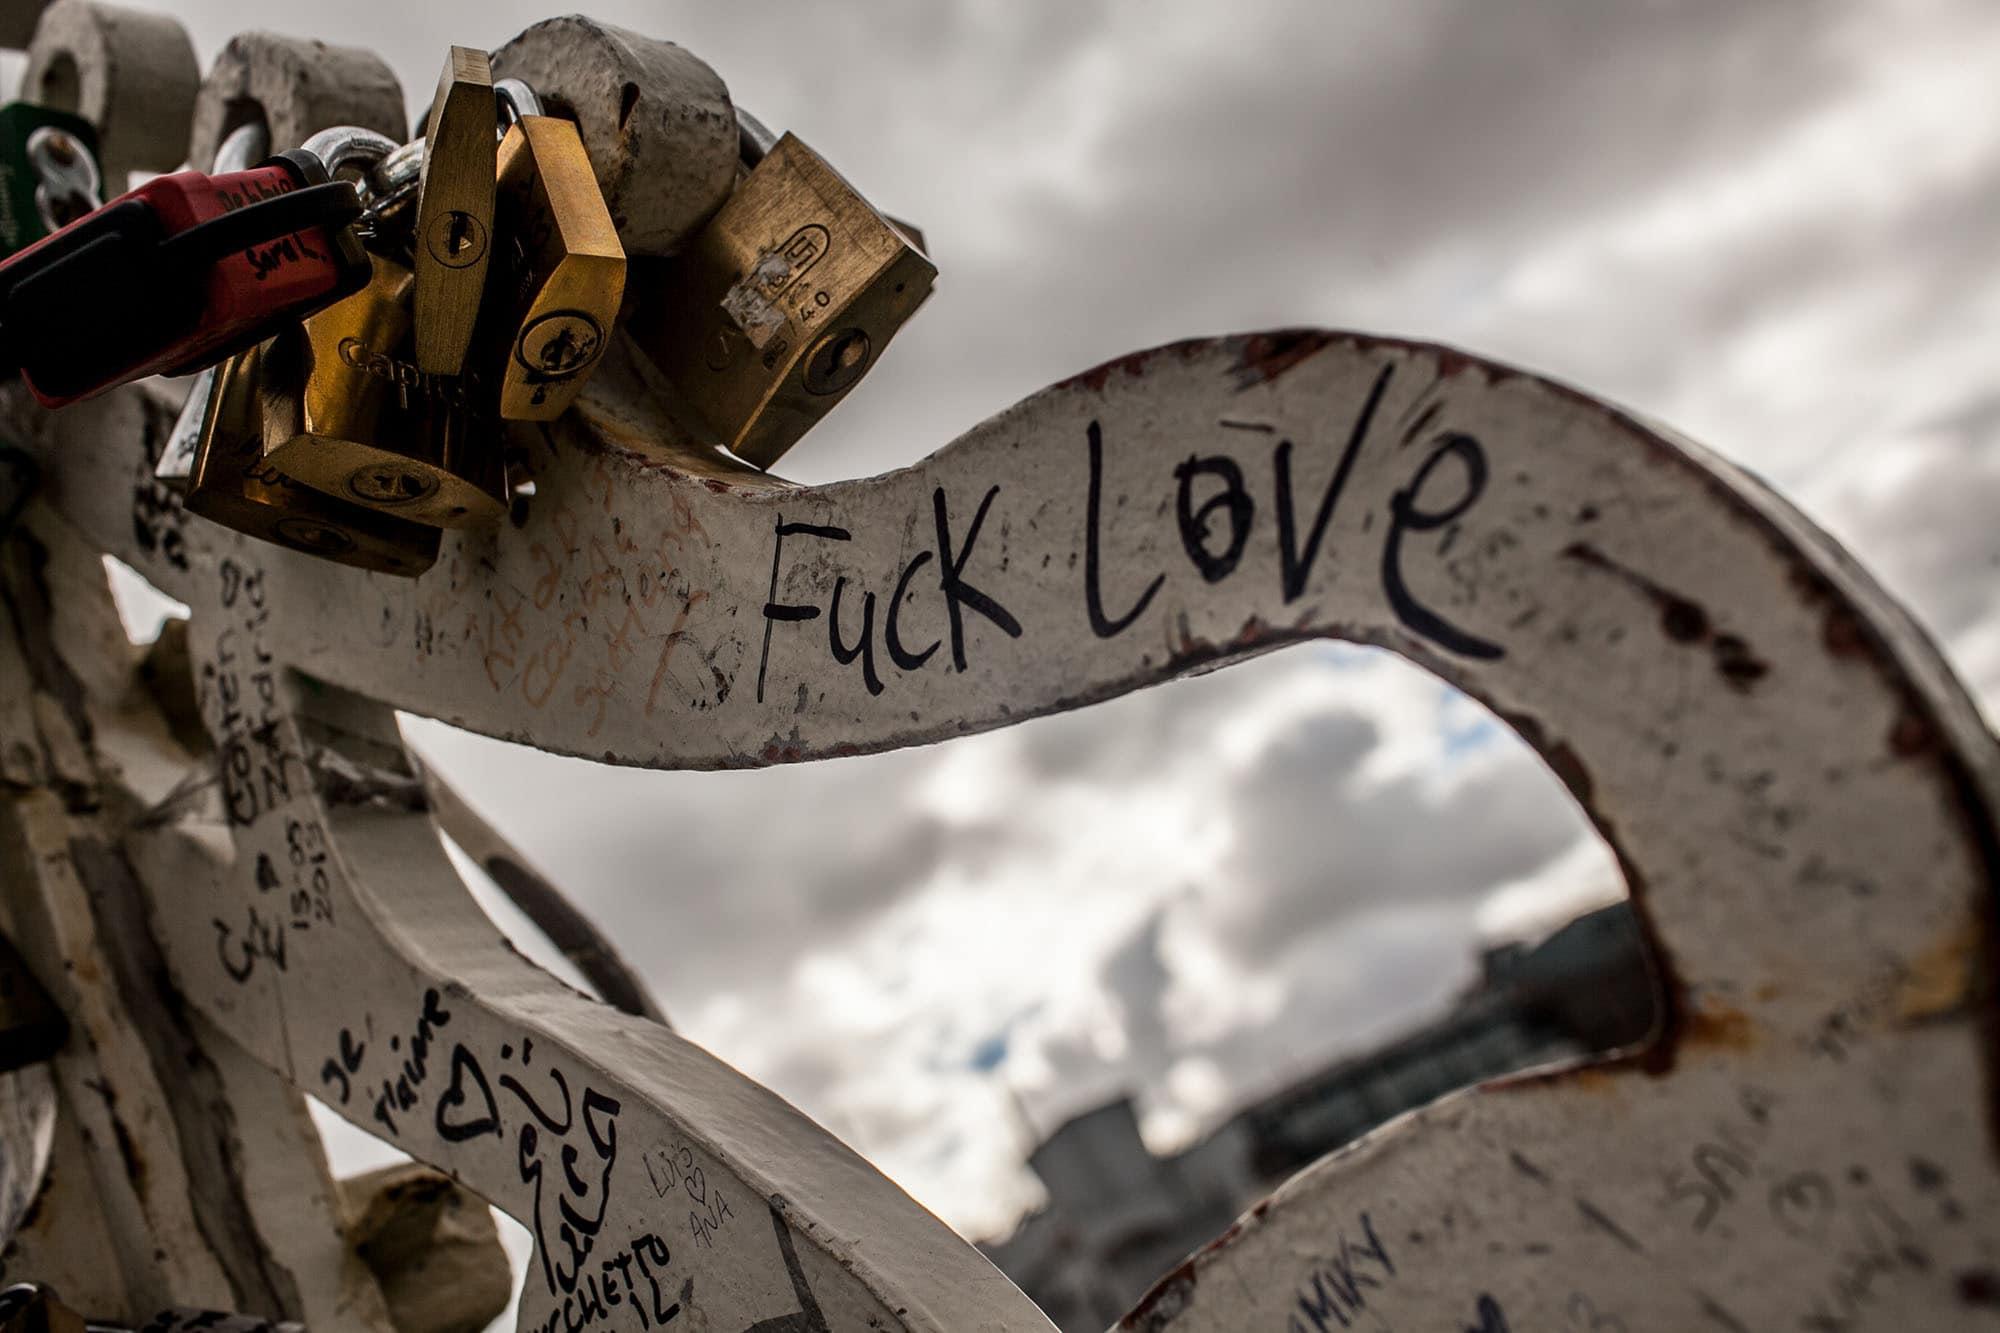 FUCK LOVE - Love Locks - Dublin, Ireland